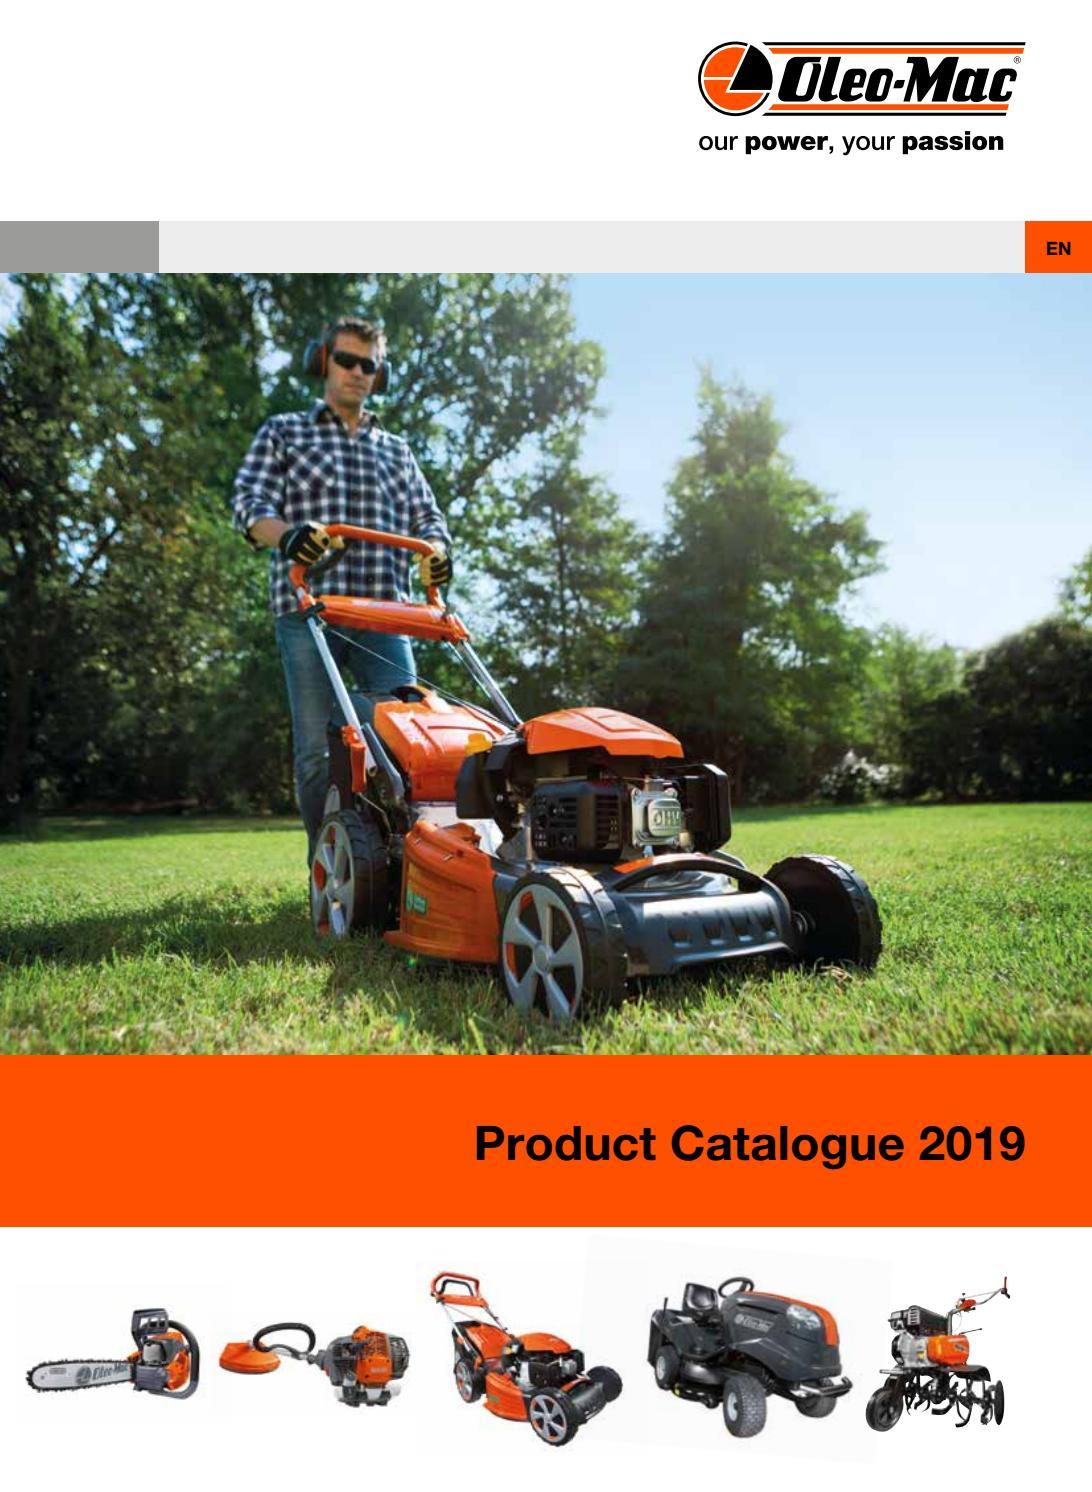 Oleo Mac Product Catalogue 2019 By Emak Spa Issuu